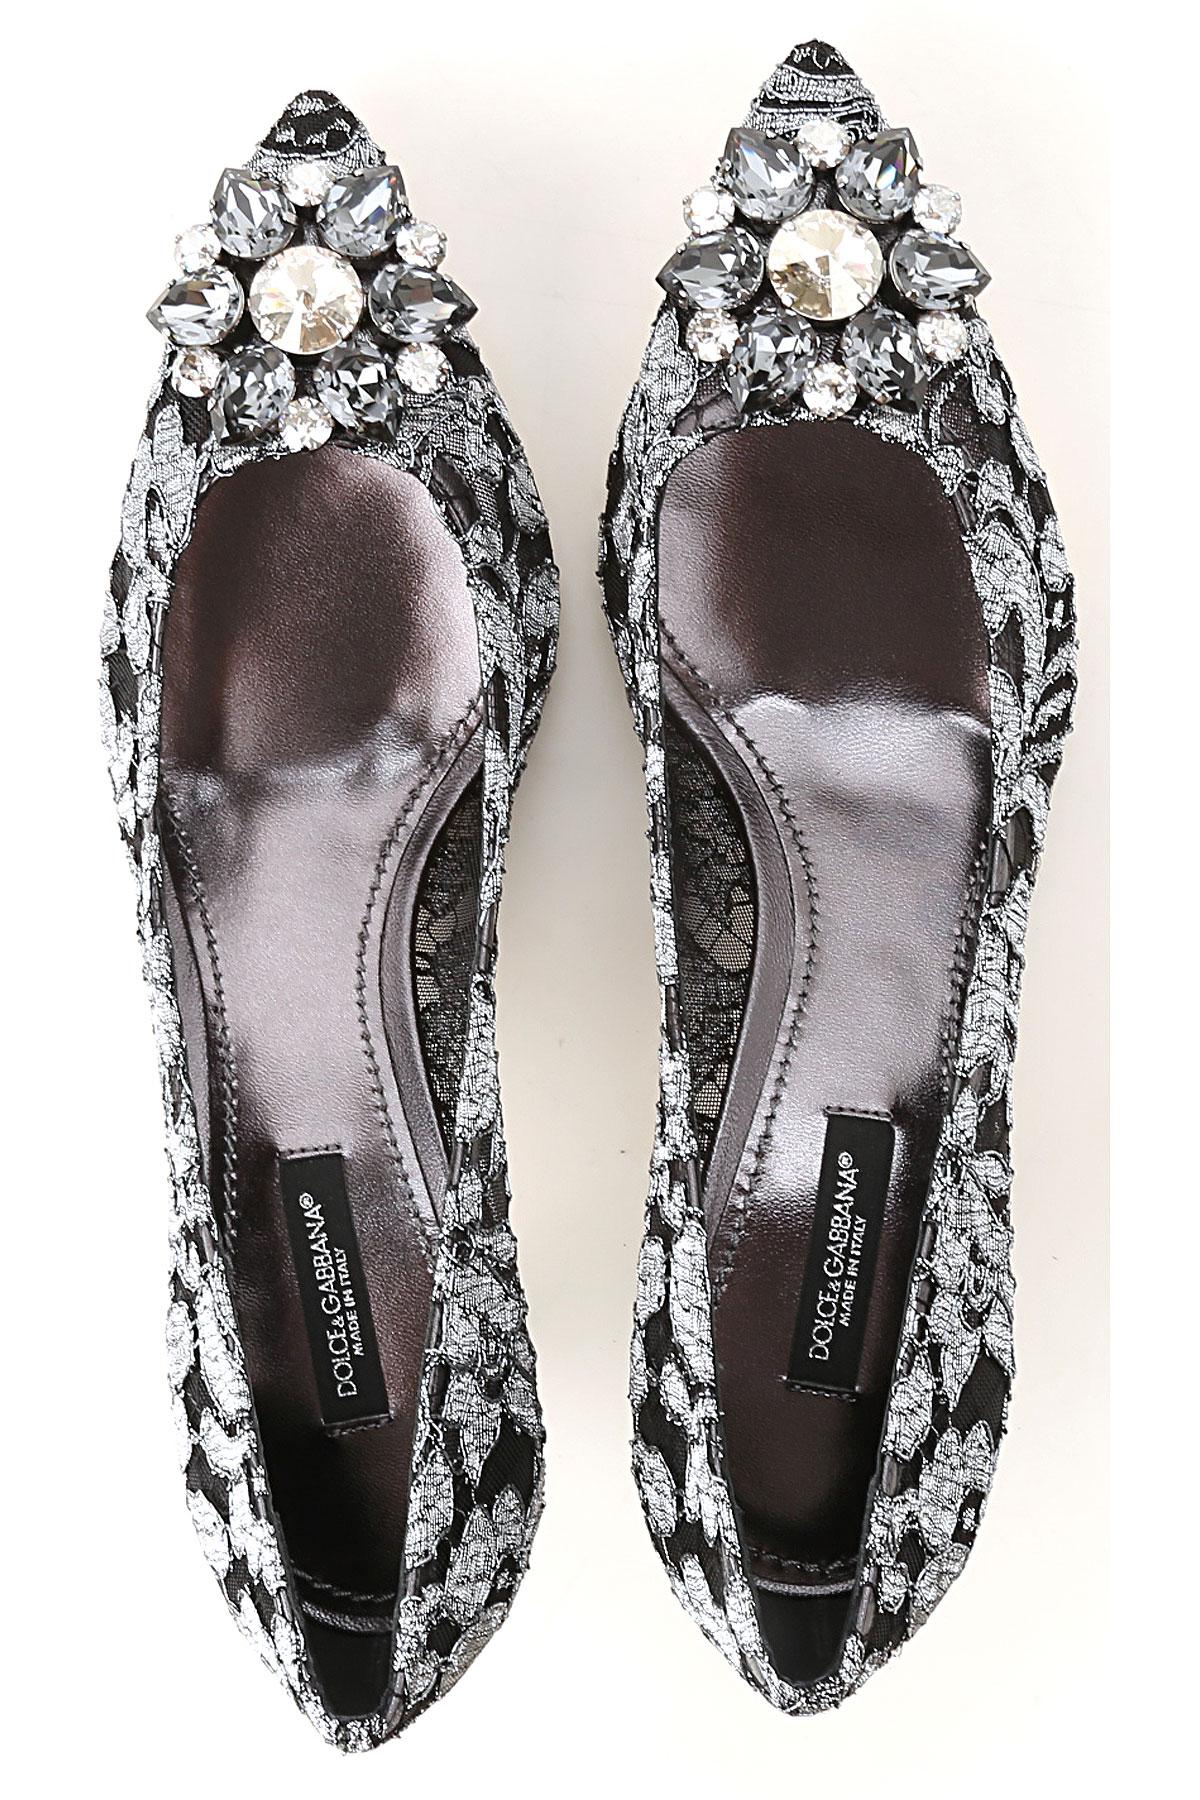 Primavera amp; Negro Gabbana Para Zapatos Plata 2019 Dolce Mujer verano SAFwTTxq